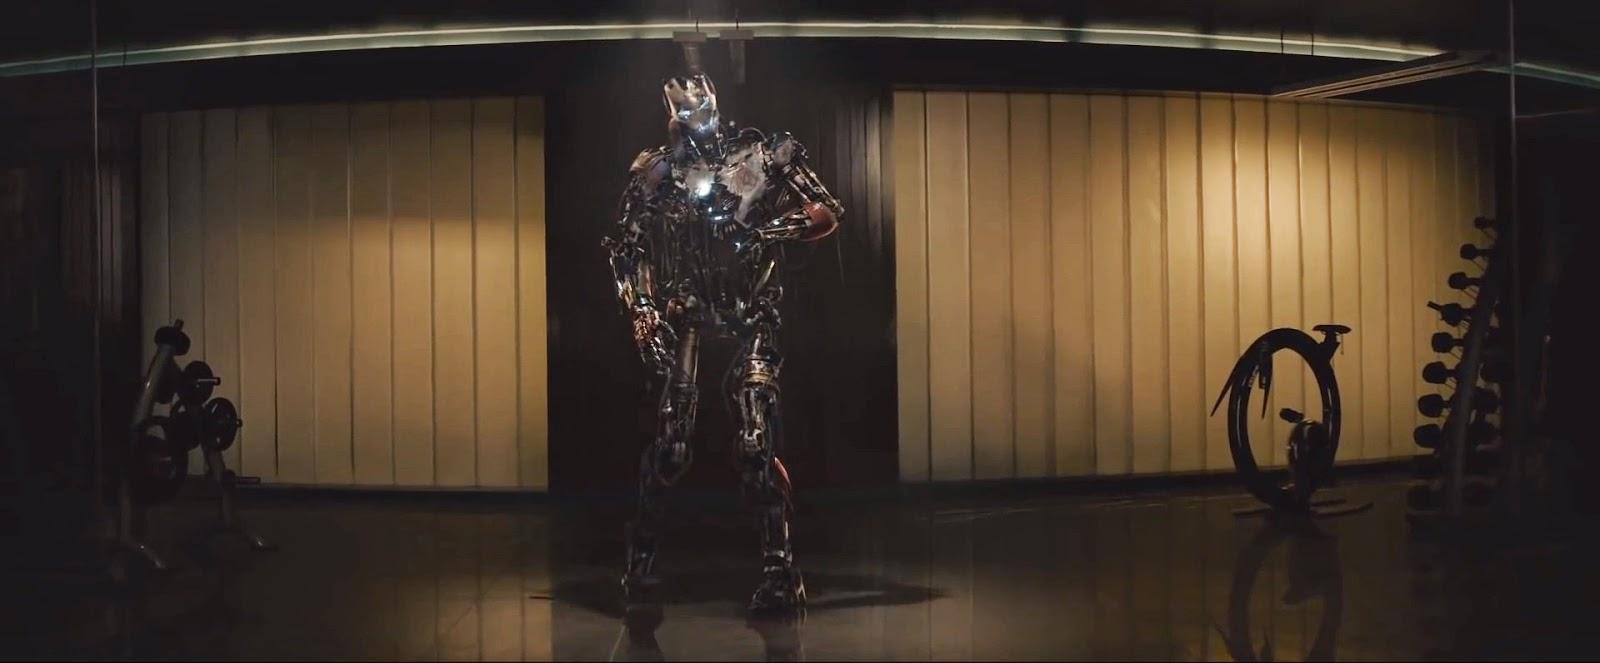 Avengers: Age of Ultron - Ultron v1